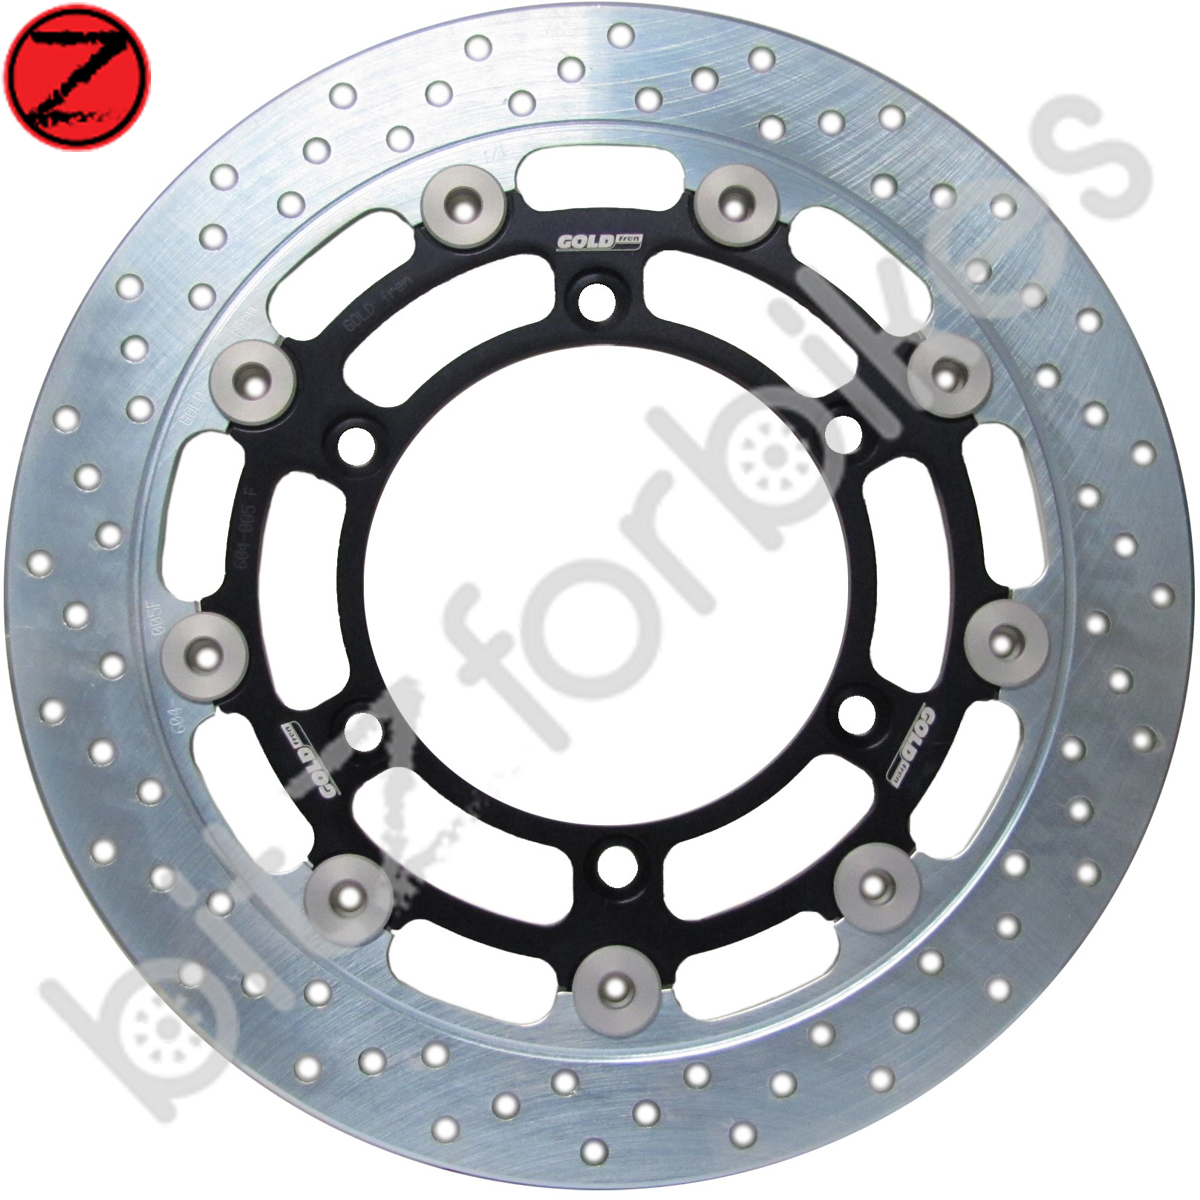 Honda CB100 CB125S CG125 CL100 SL100 XL100 CAP TAPPET VALVE NOS 12361-383-000